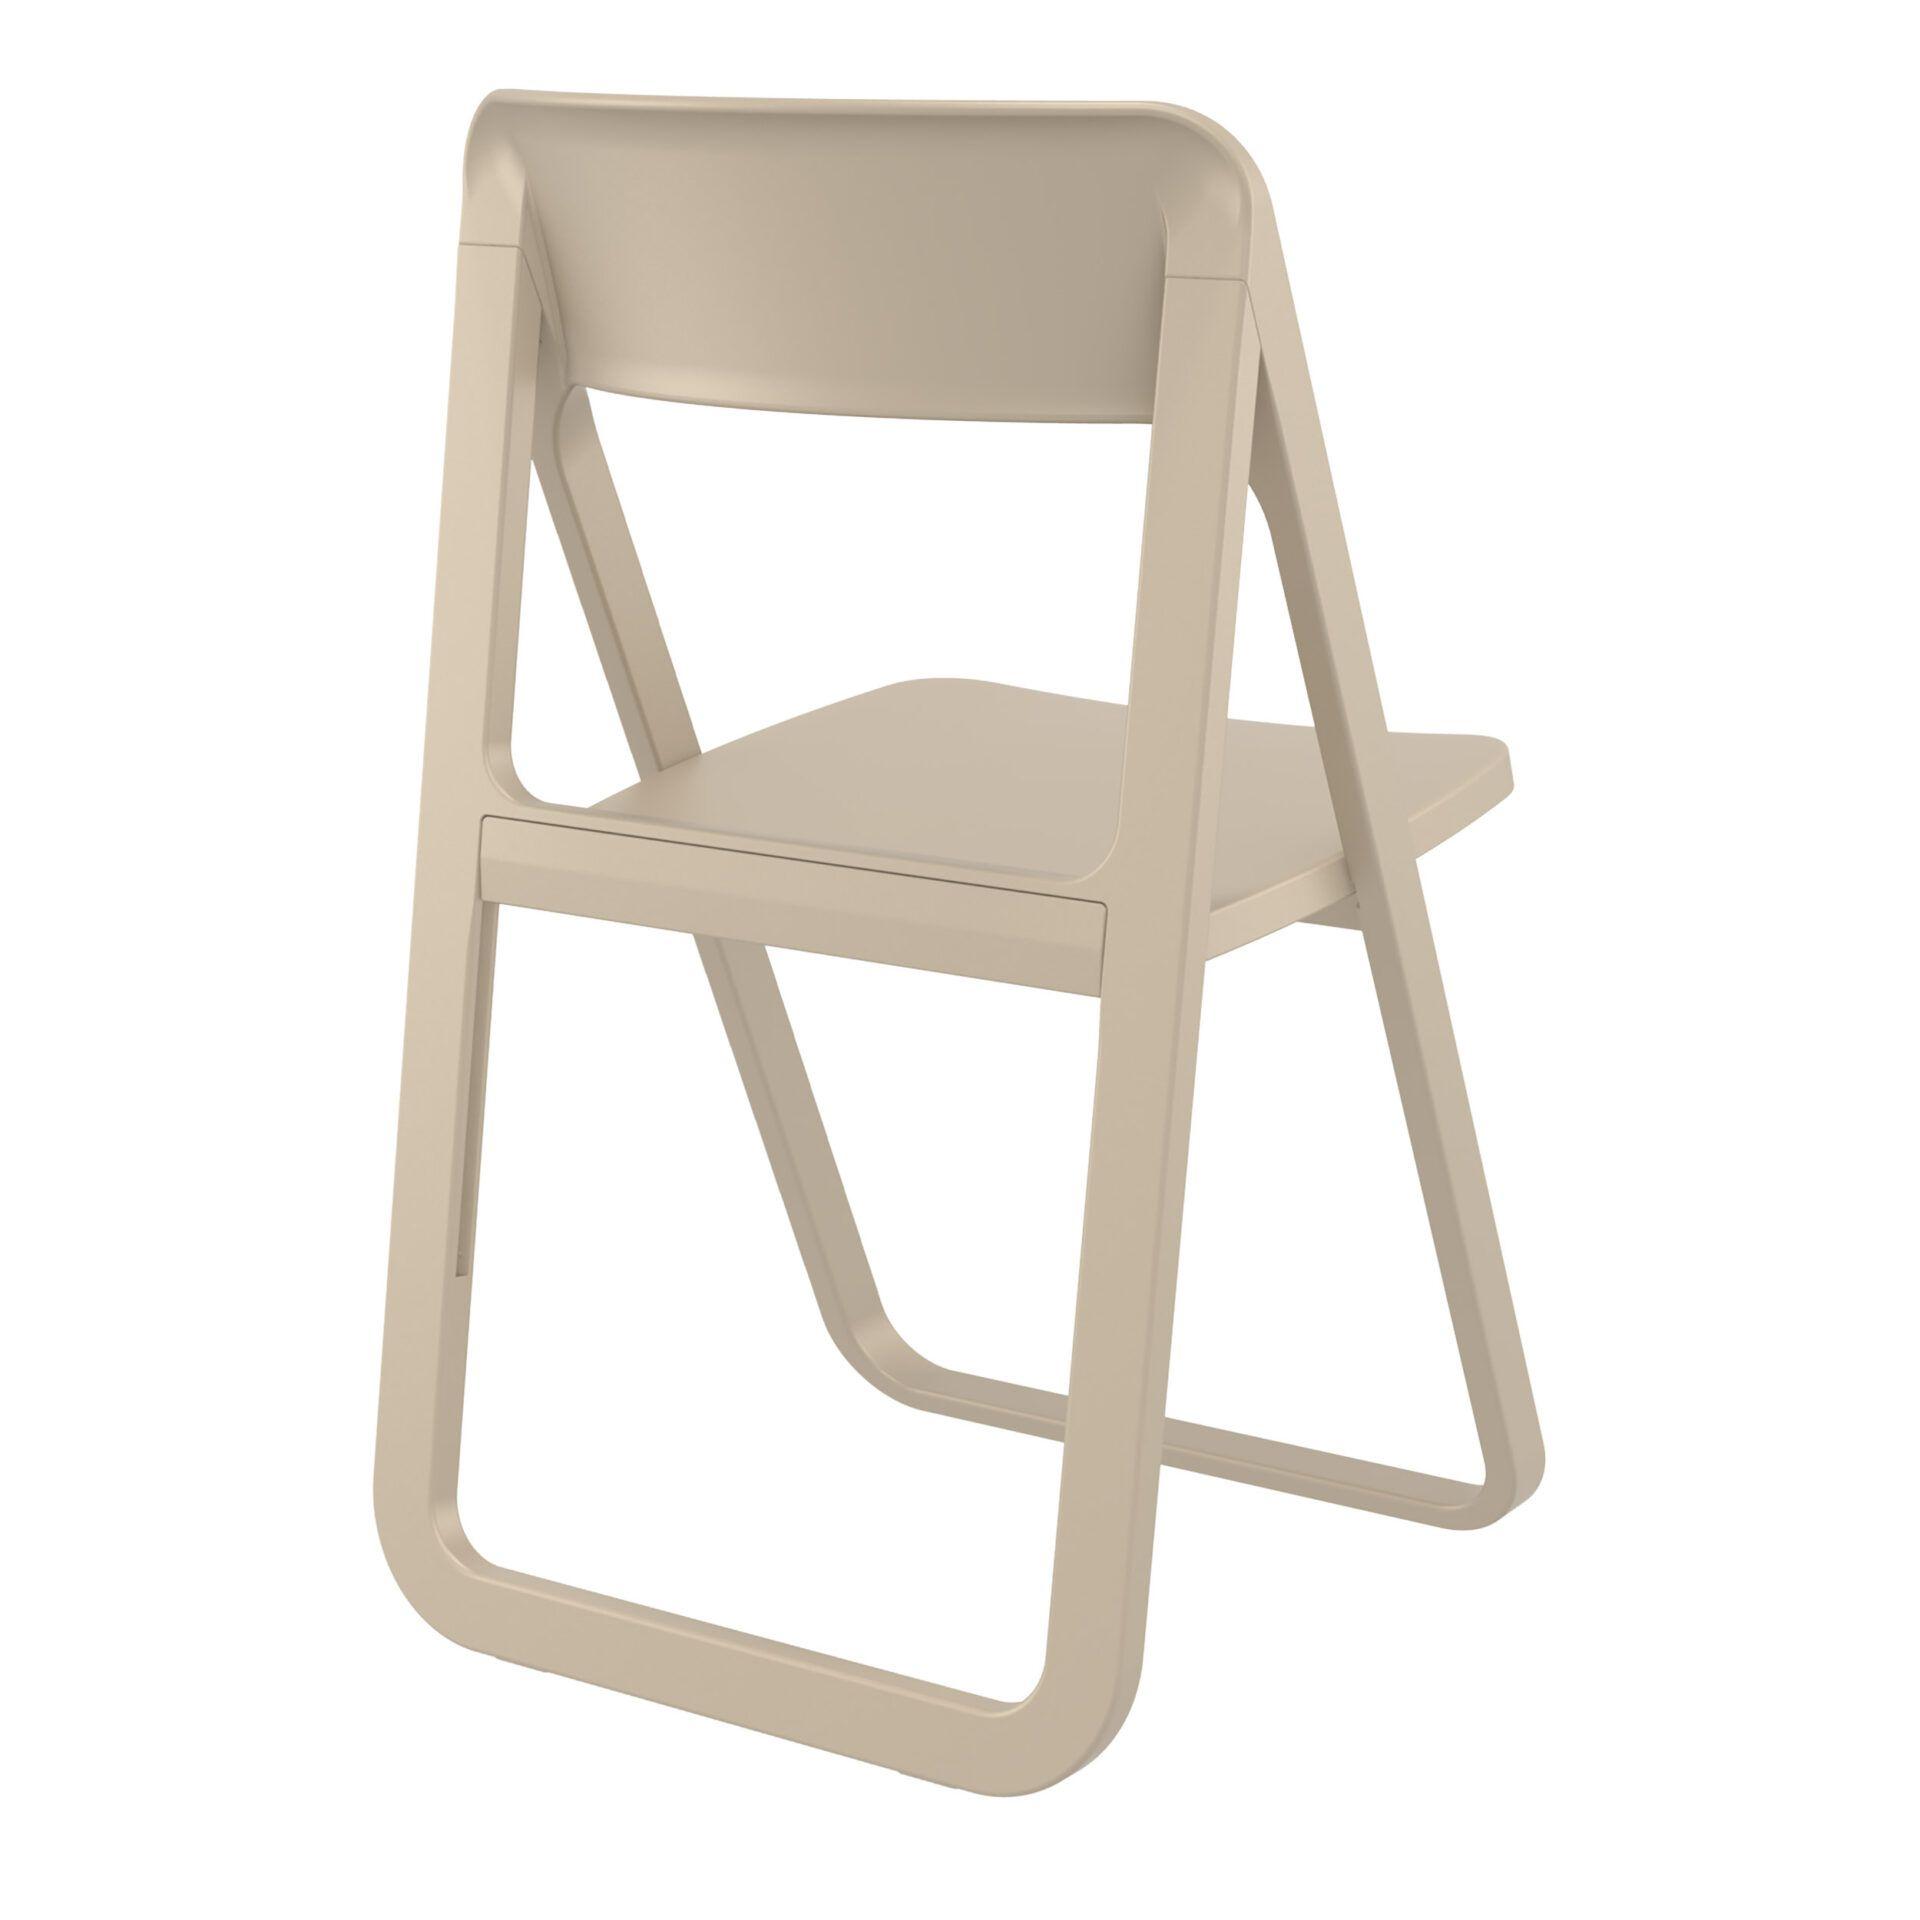 polypropylene dream folding chair taupe back side